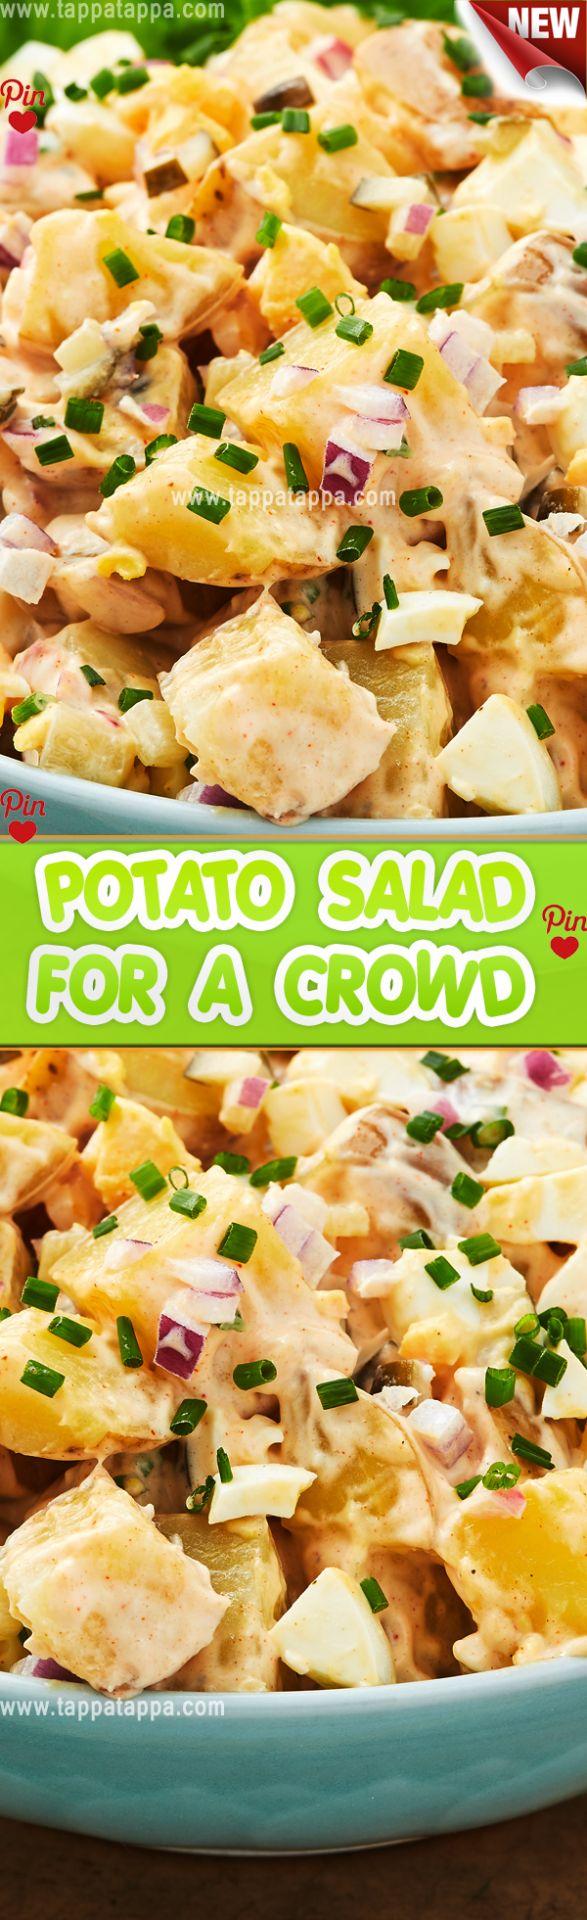 Epic Potato #Salad POTATO SALAD FOR A CROWD What I love about potato salad is th…